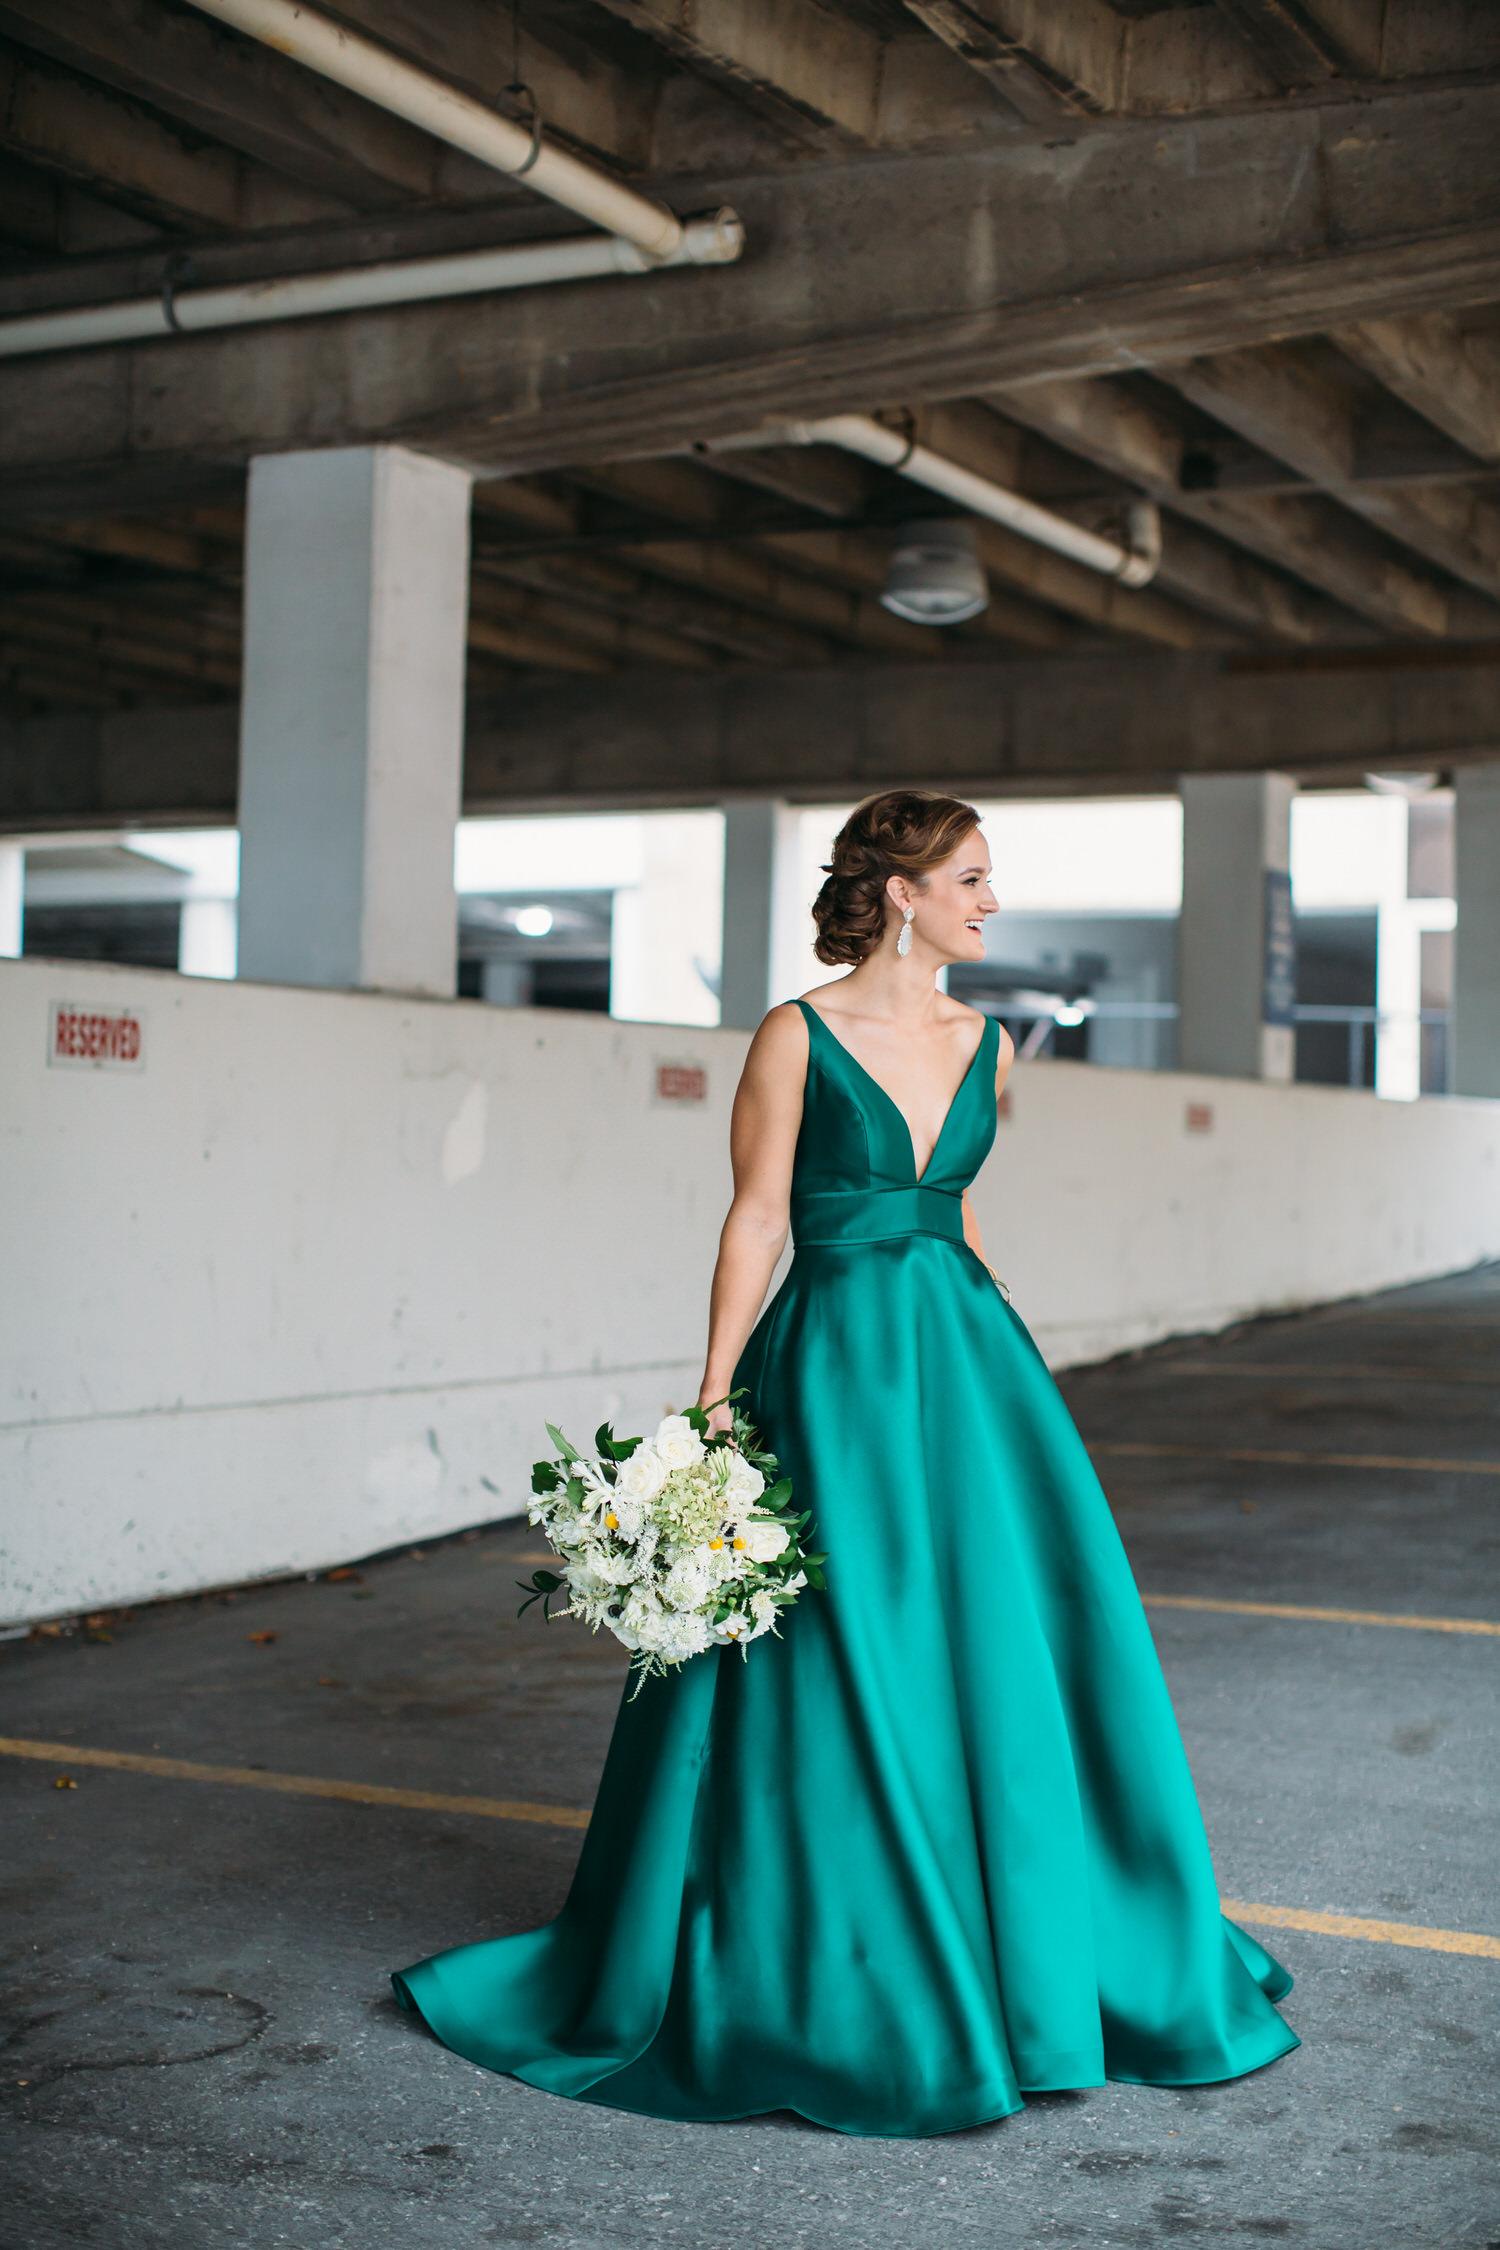 Green wedding dress. Seattle wedding photographer